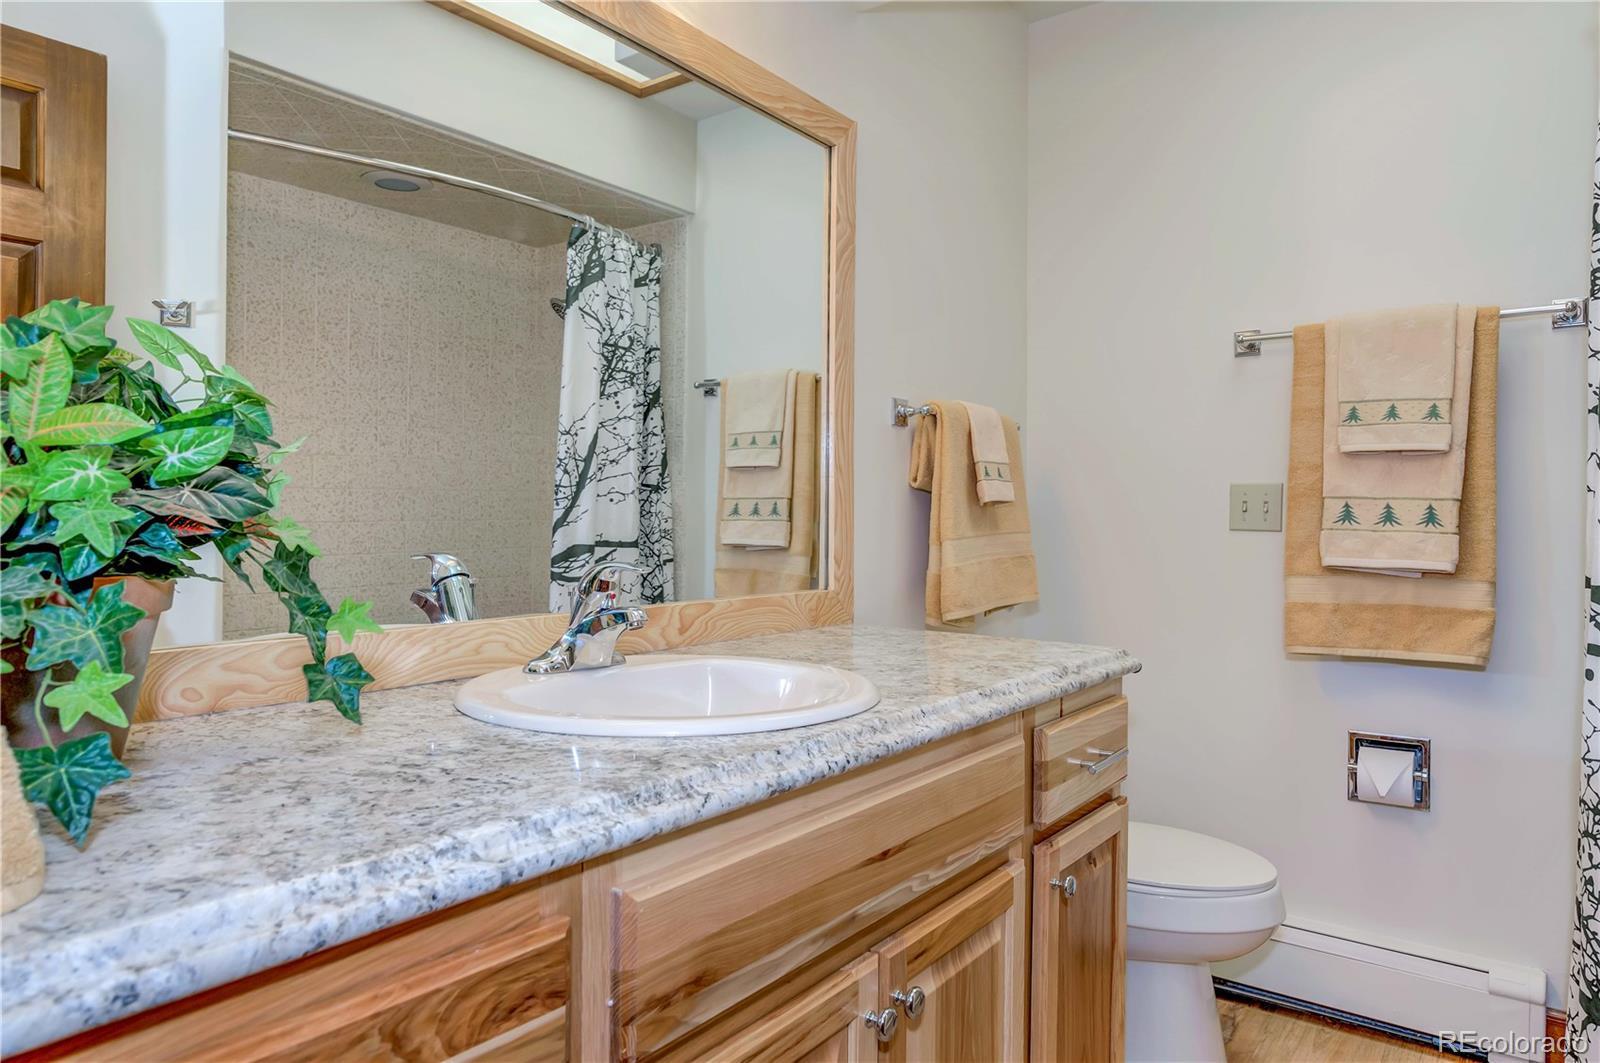 MLS# 5539974 - 21 - 5505 Saddle Rock Place, Colorado Springs, CO 80918